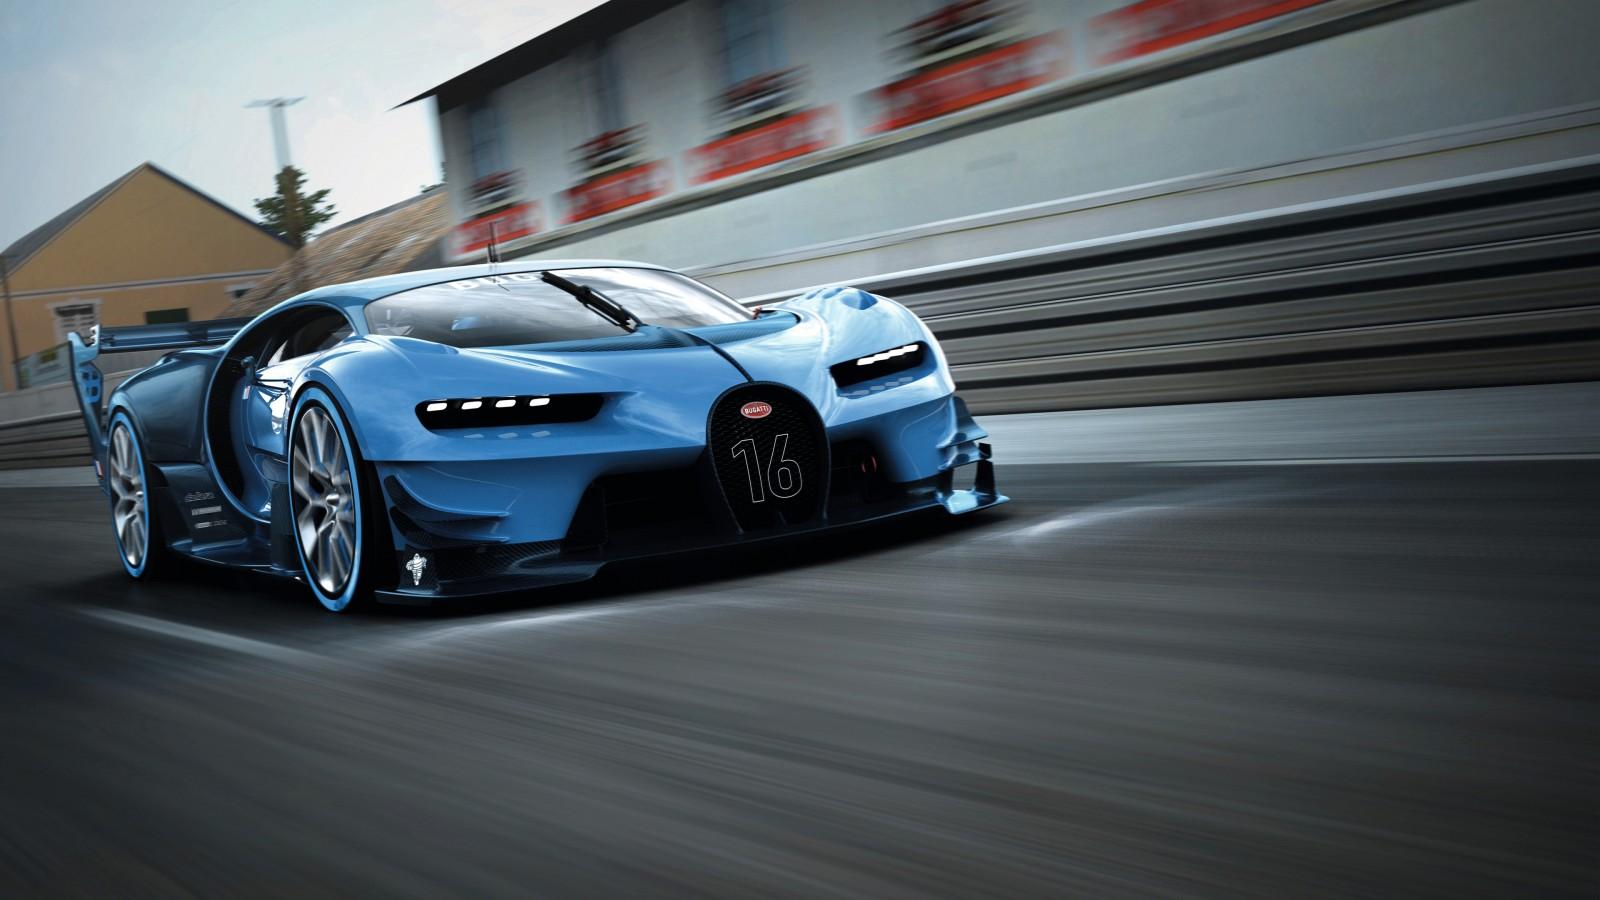 Bmw Hd Wallpapers 1080p Download Bugatti Vision Gran Turismo 2015 Wallpaper Hd Car